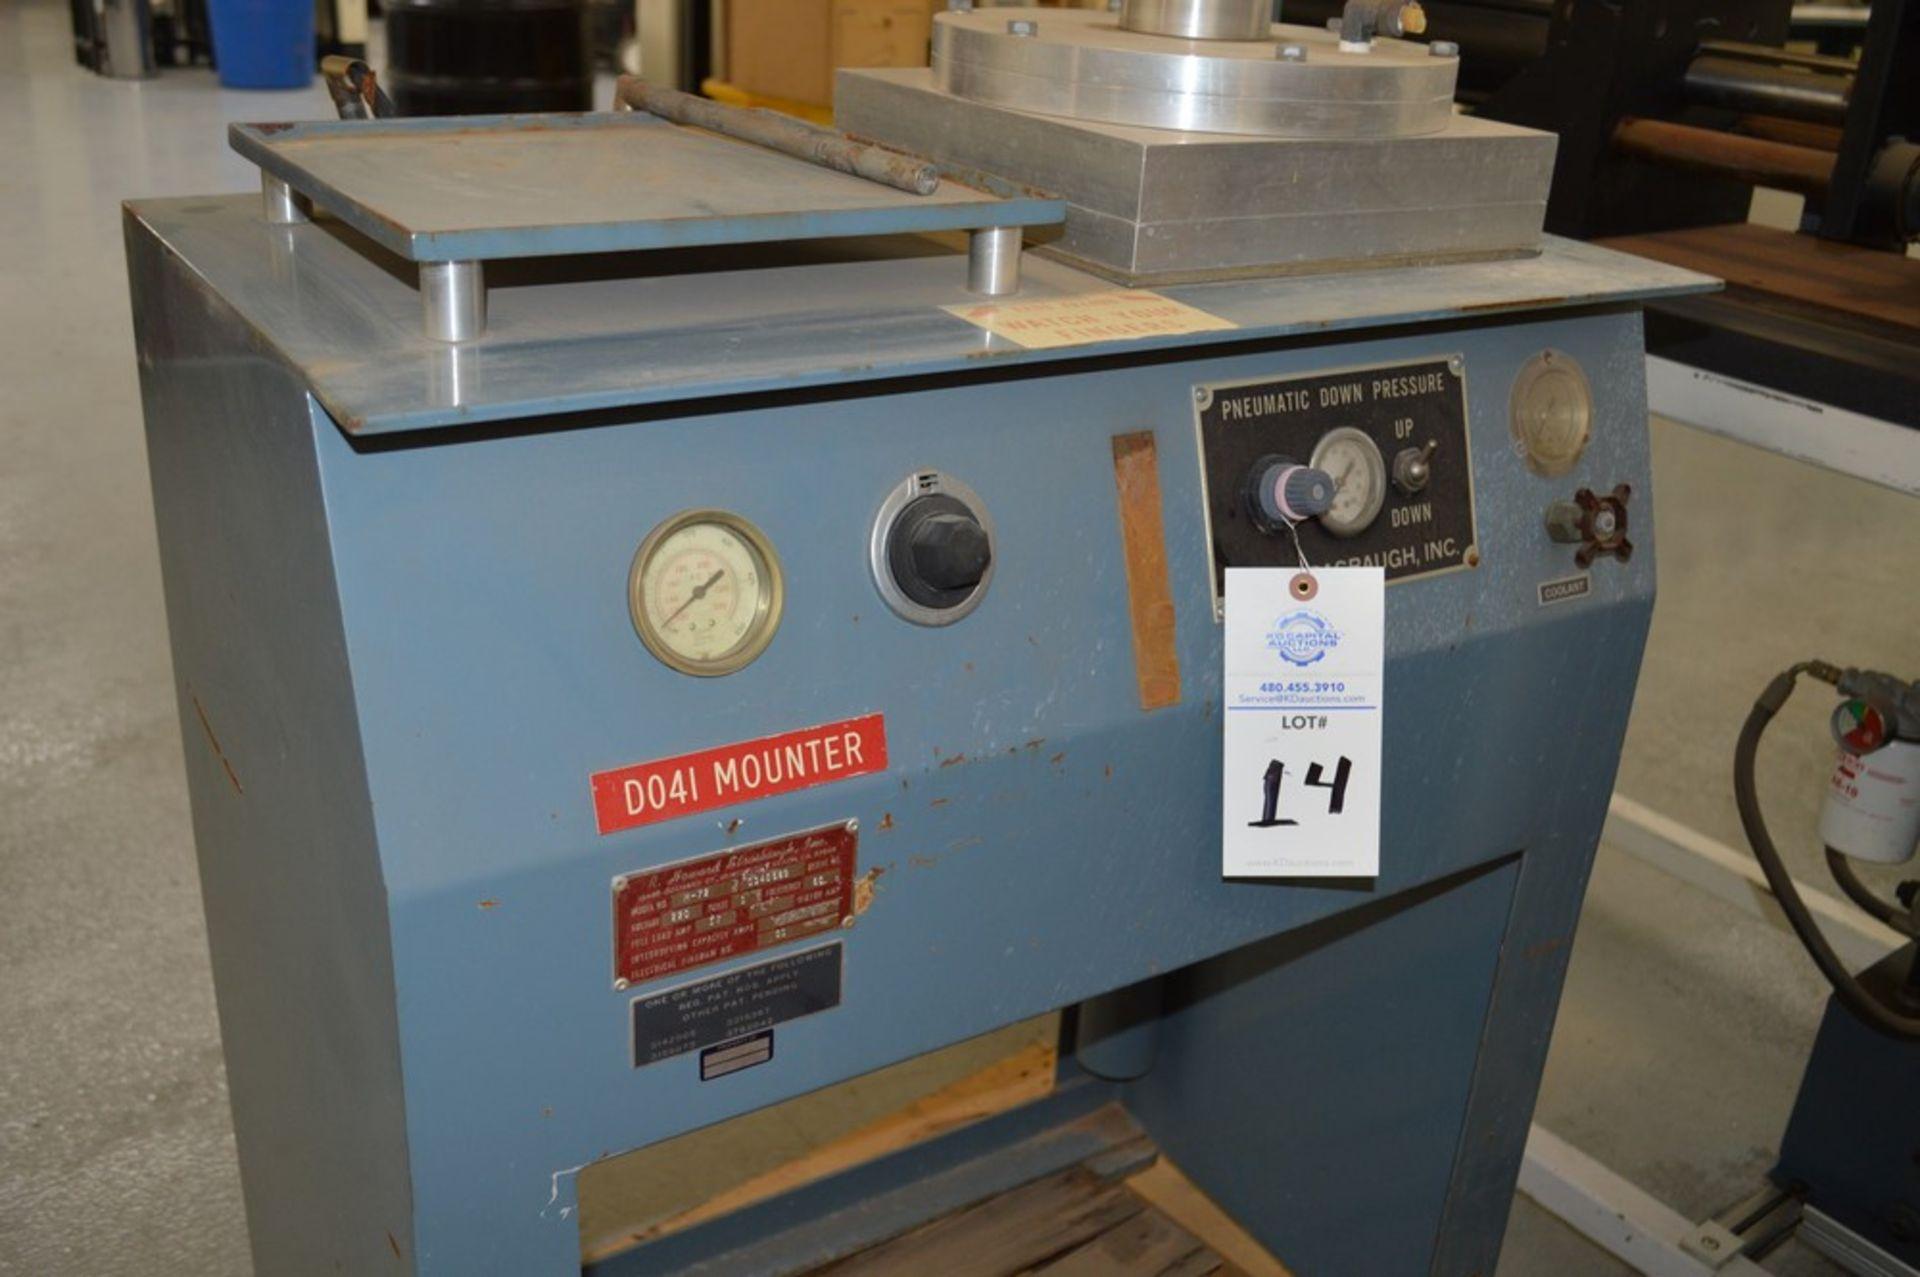 R Howard Strausbaugh, Model M-75, peunmatic press on skid. Mounting press - Image 2 of 6